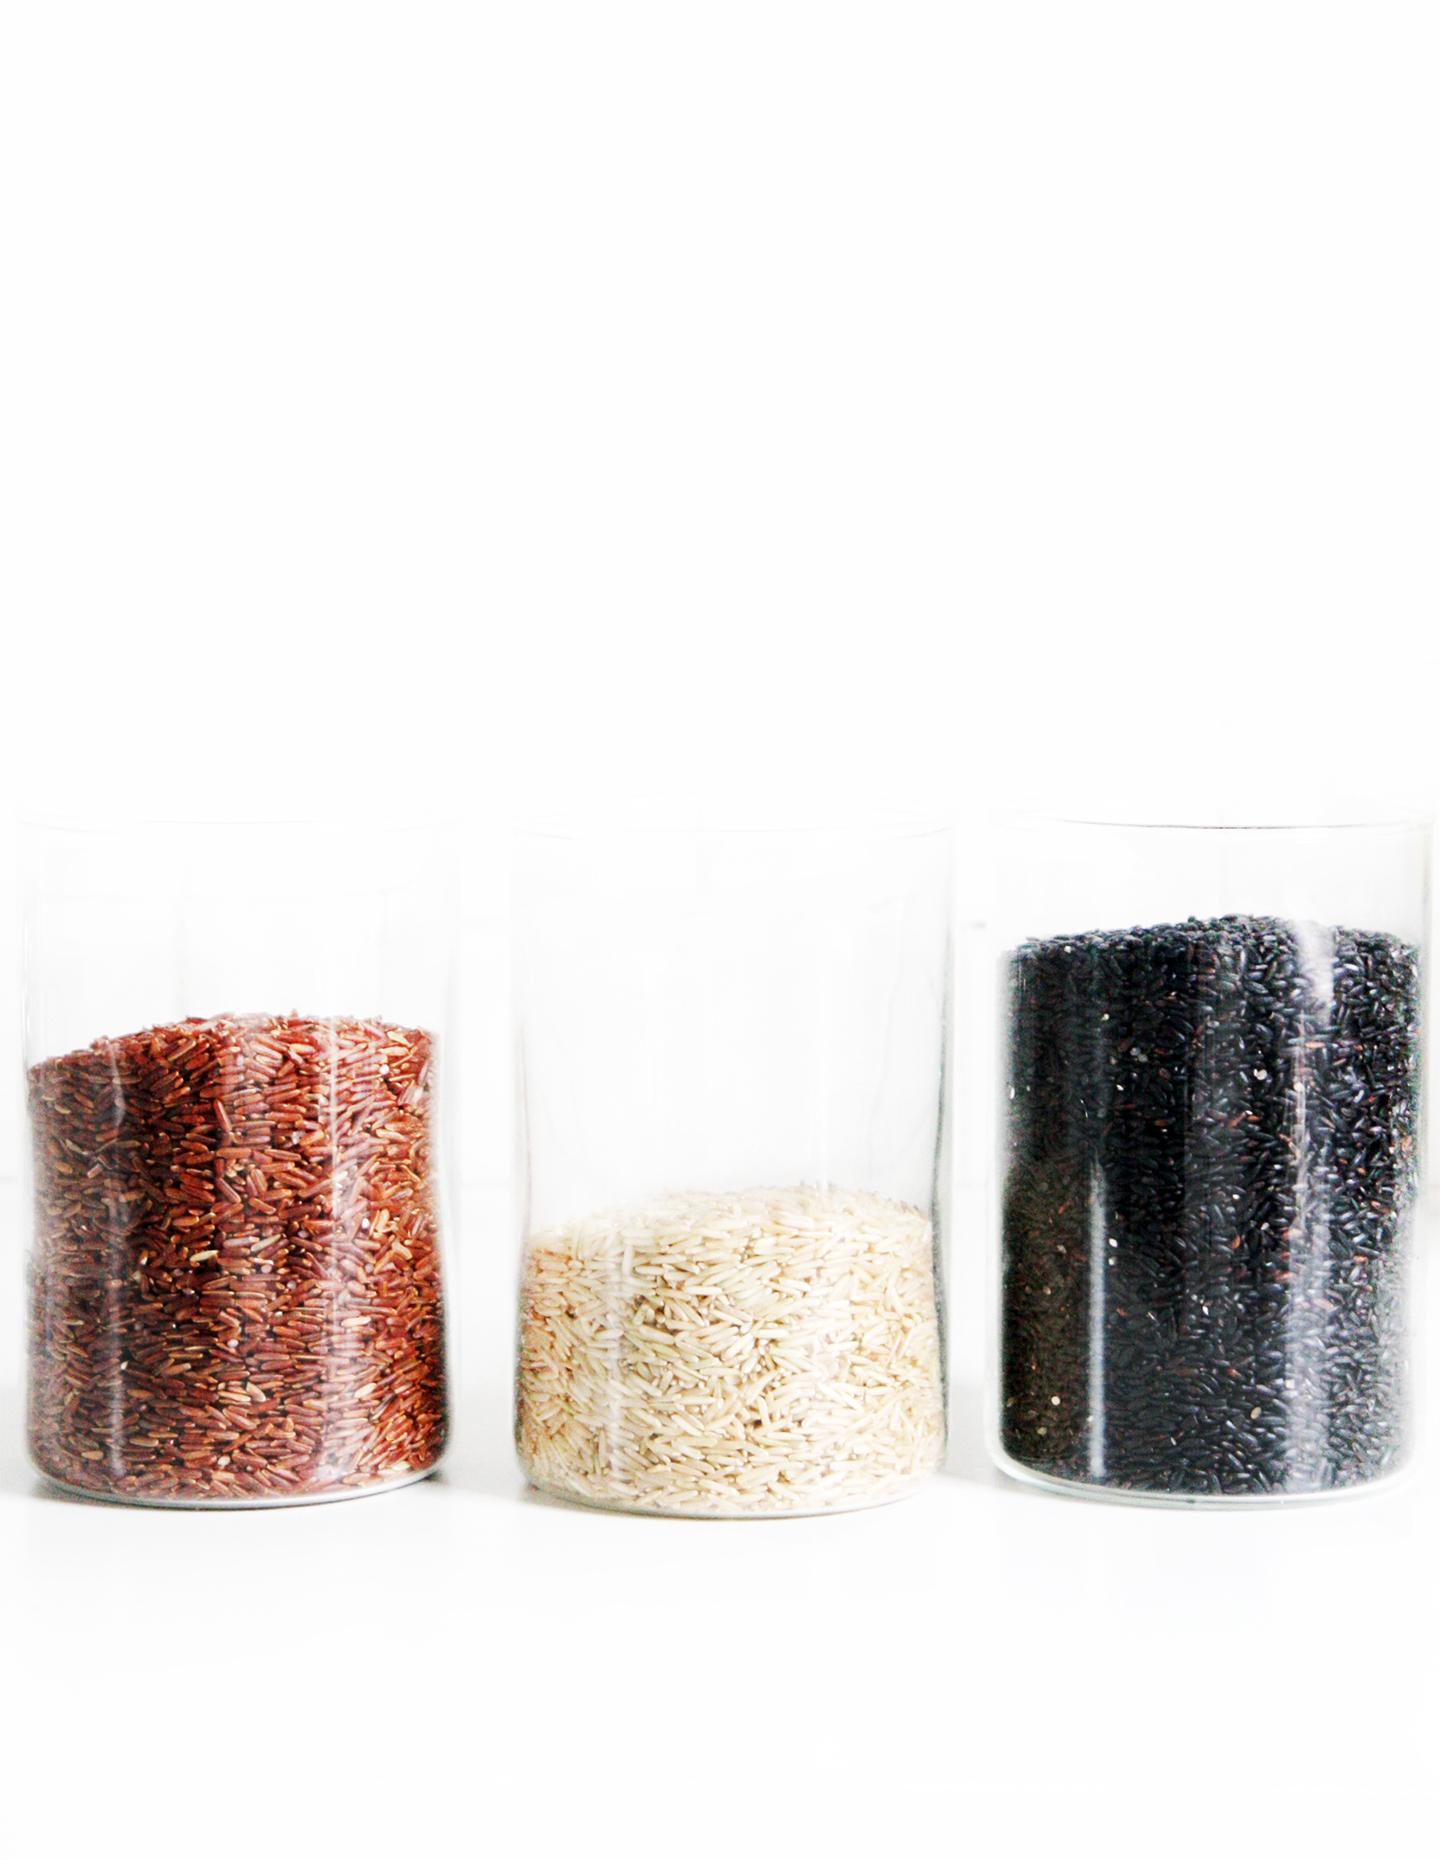 20140723_whole grain rice_02B.jpg